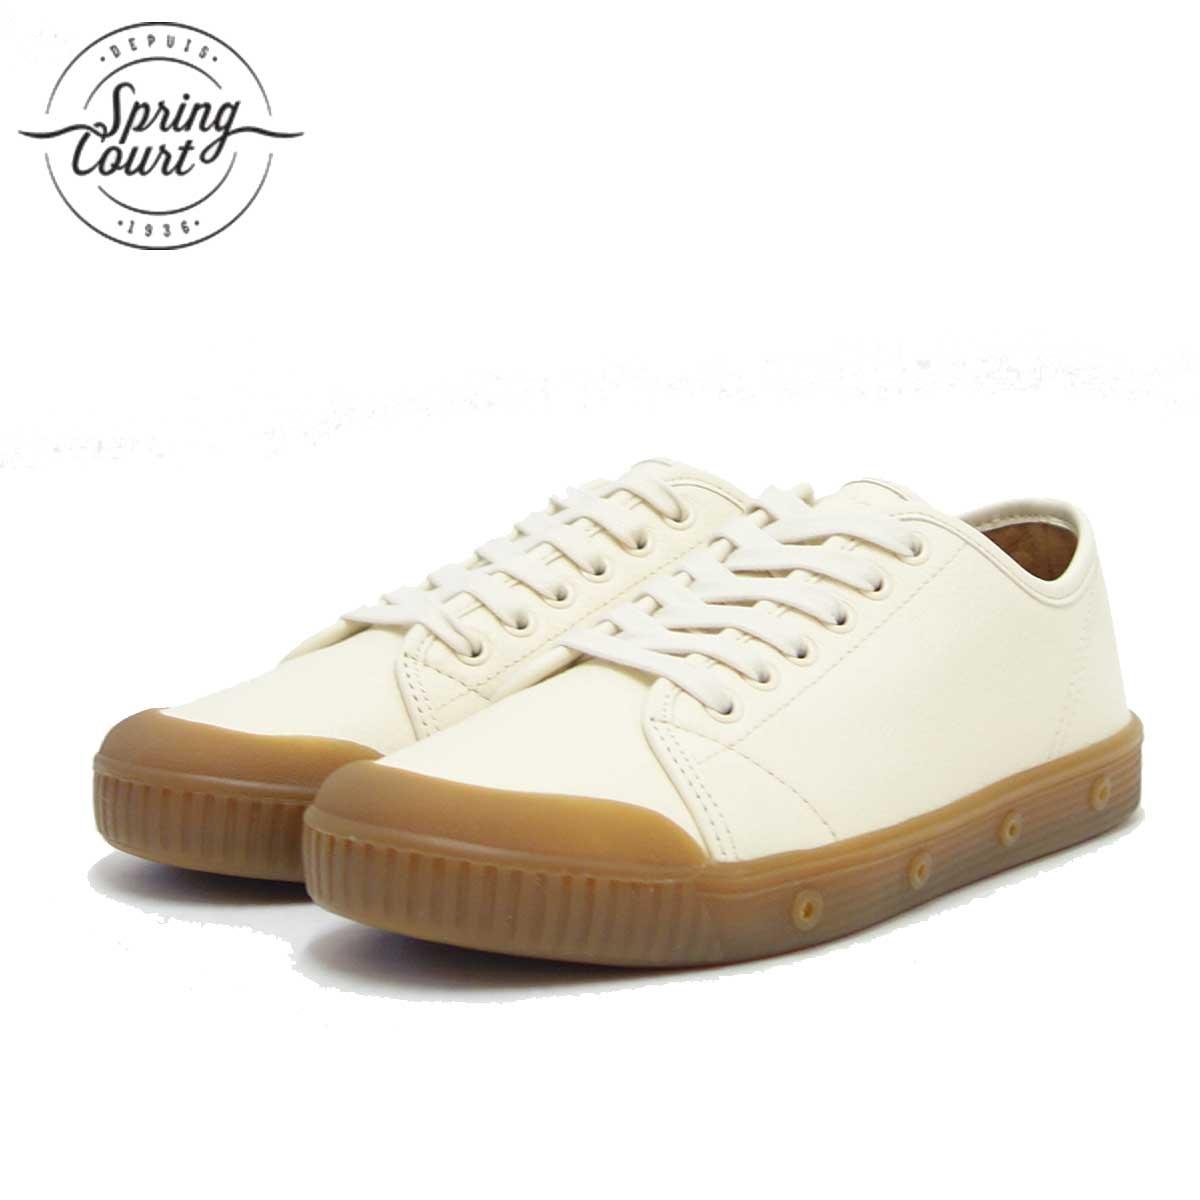 Spring Court スプリングコート G2N-6GL(メンズ)G2 GRAINY LEATHER OFF-WHITE 天然皮革のローカットスニーカー 「靴」